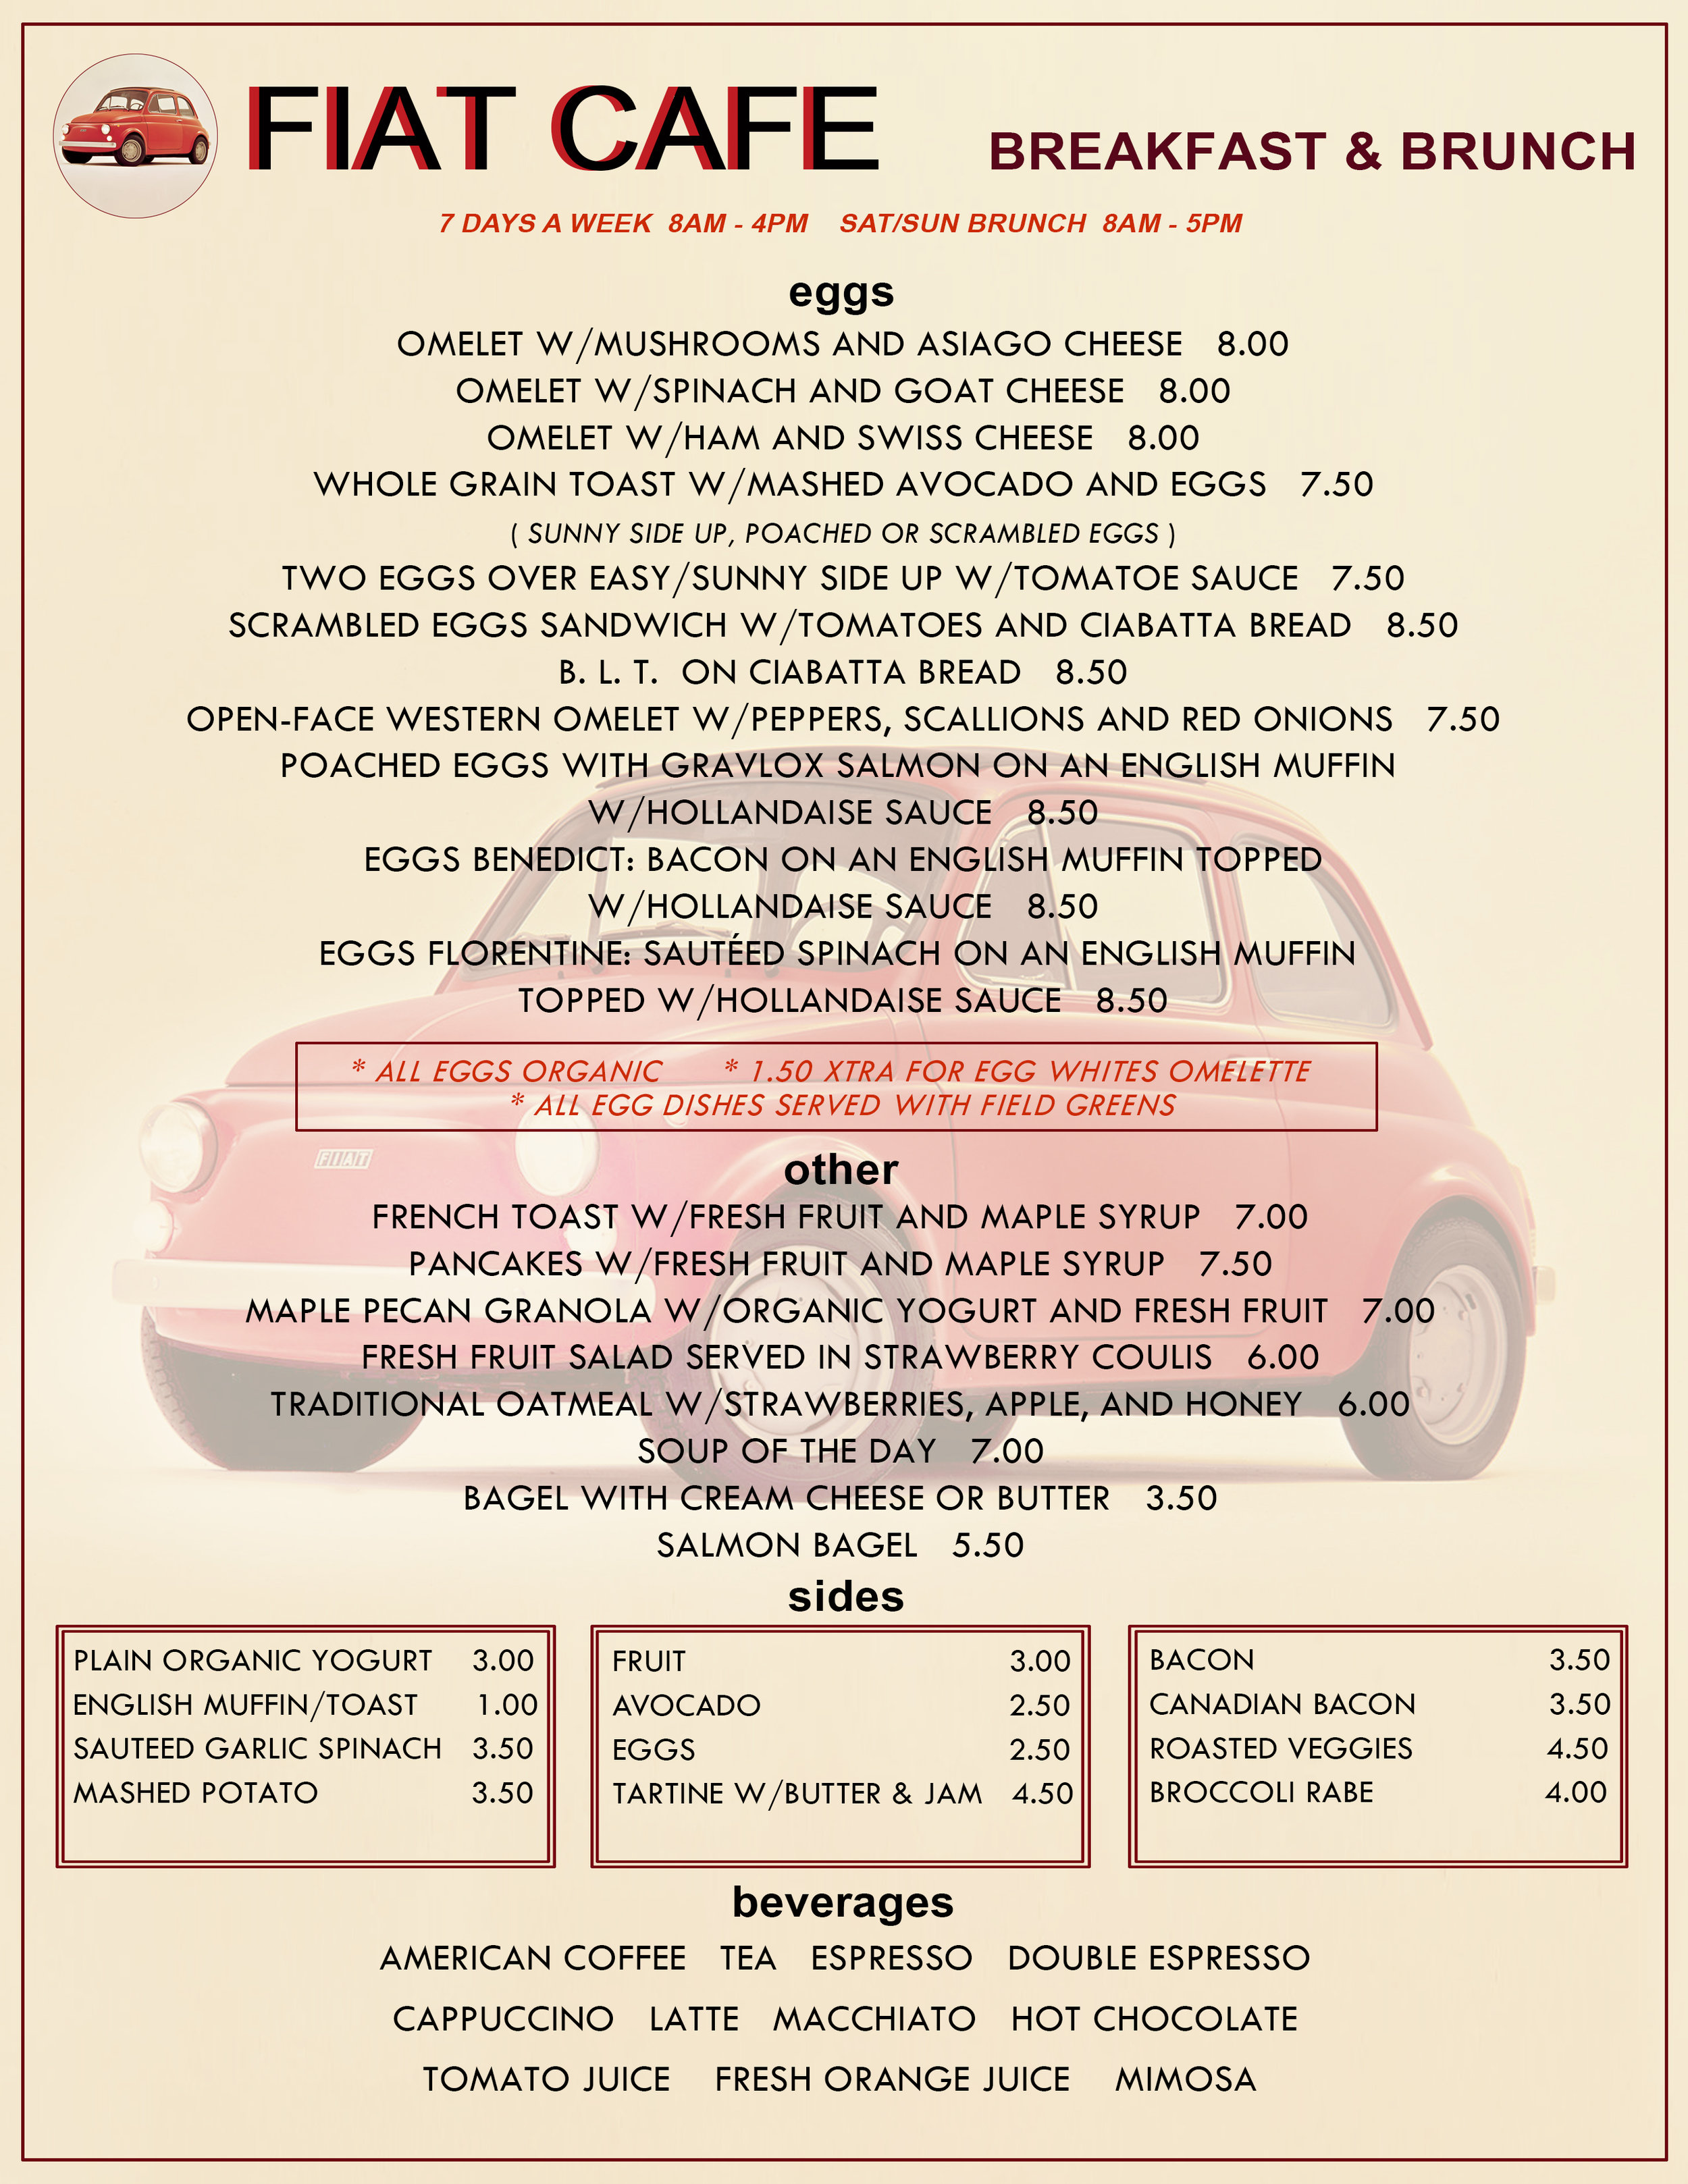 Breakfast/brunch menu layout and design for Fiat Cafe.